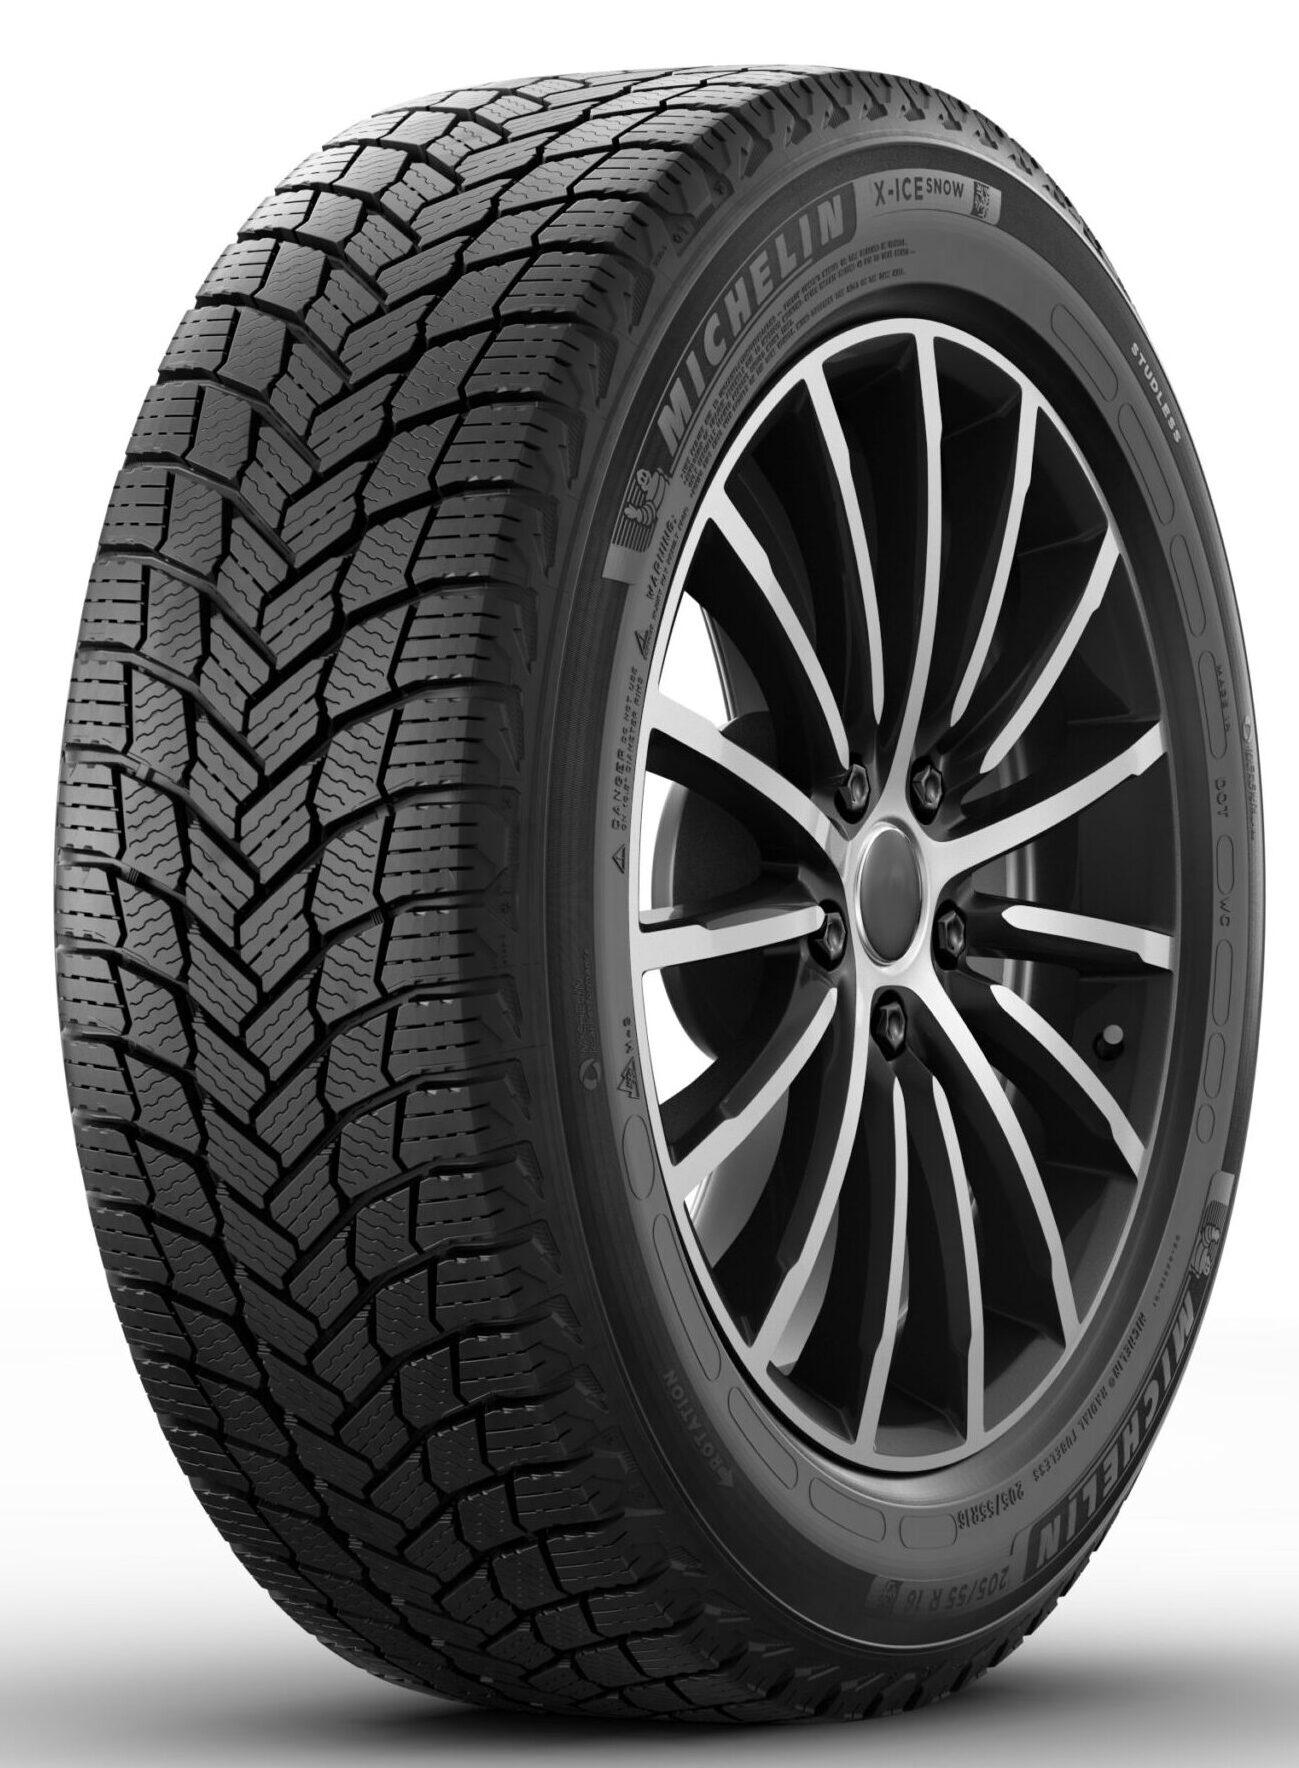 Michelin X-Ice Snow tire 2021